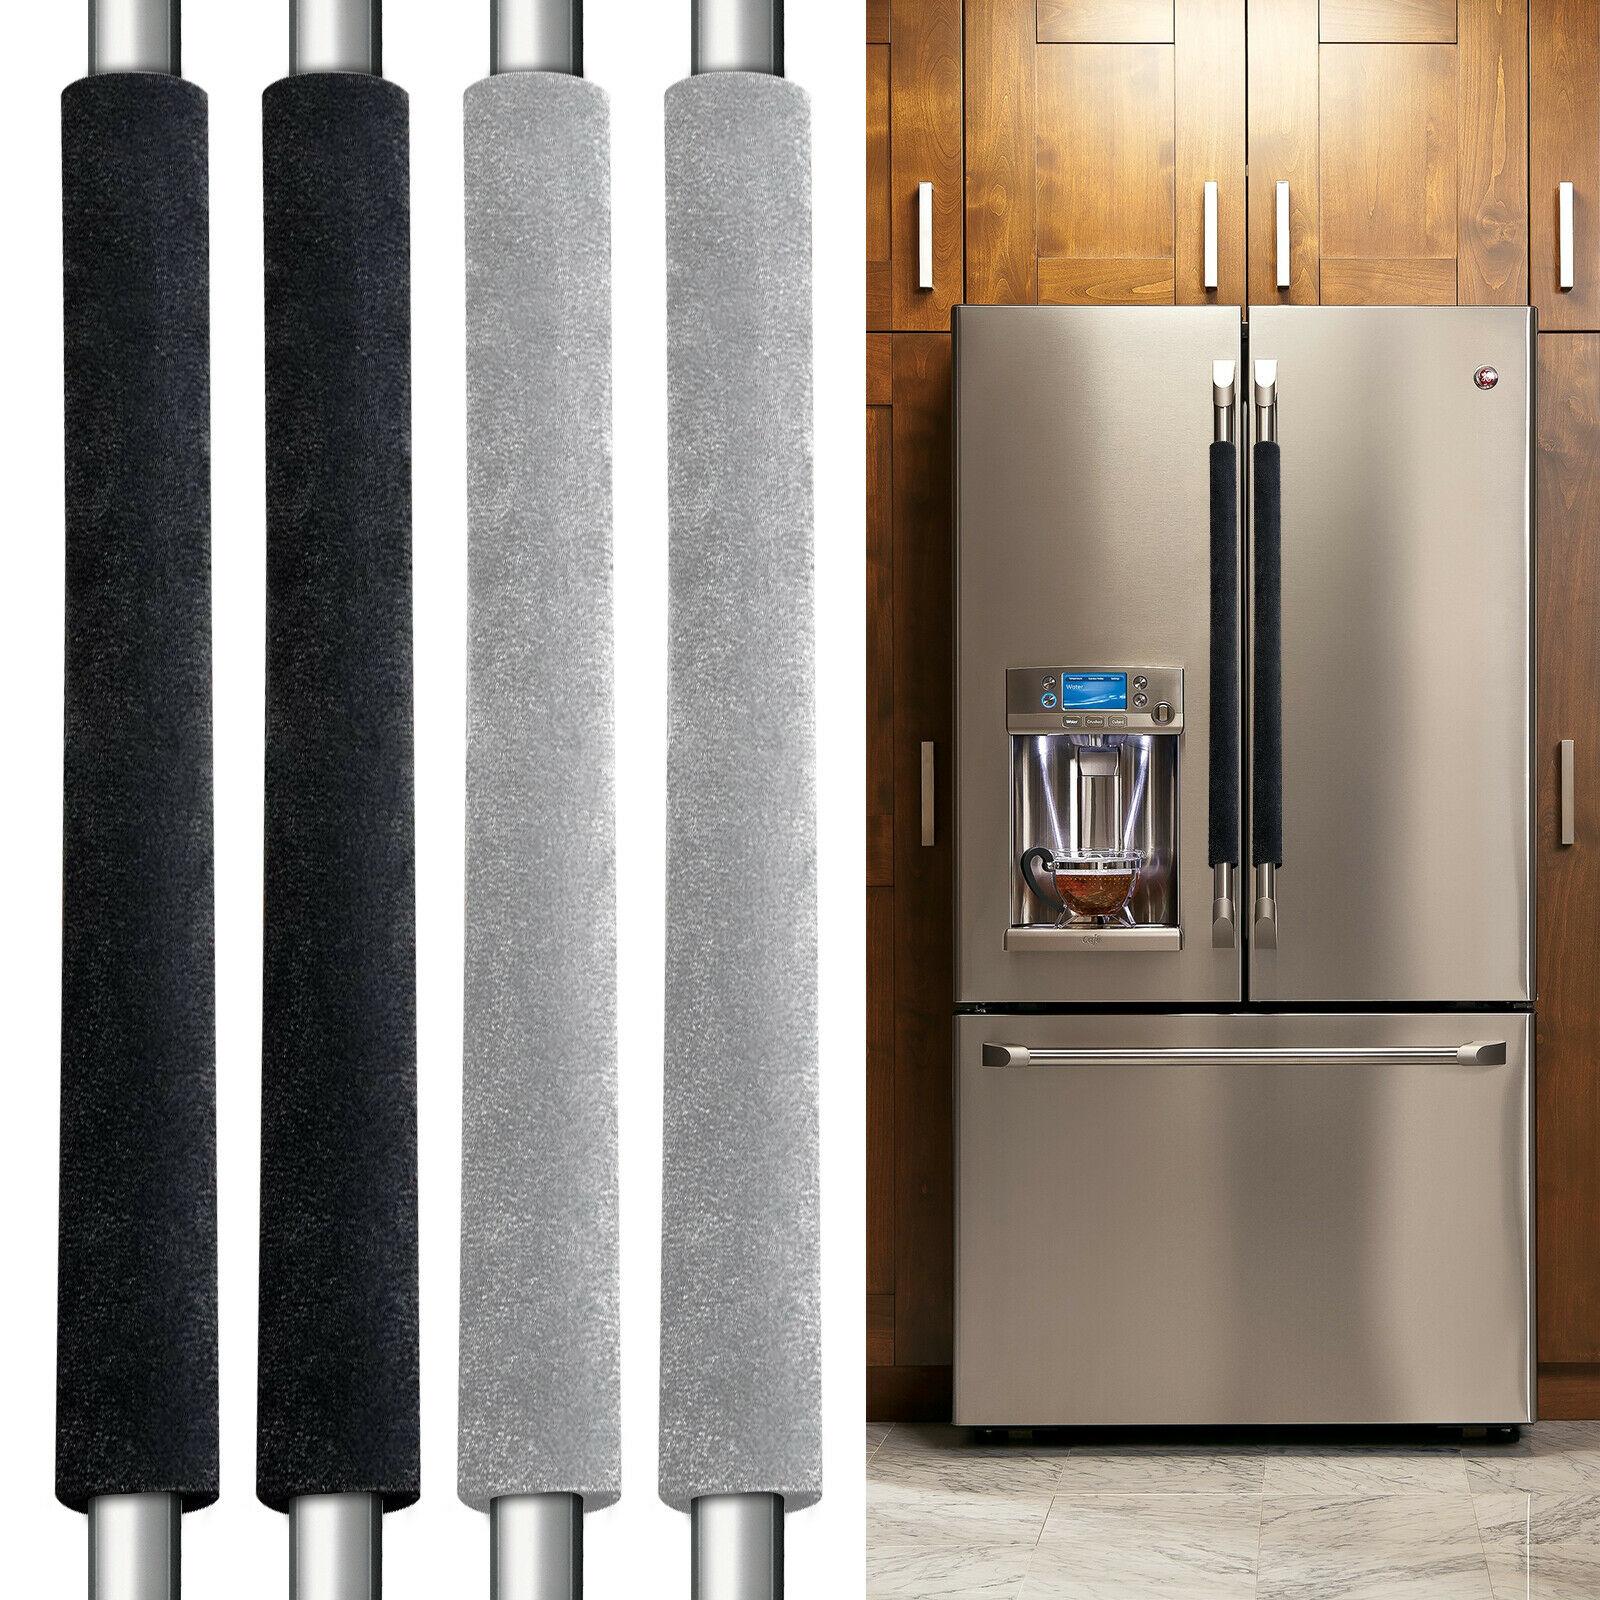 2Pcs/Set Black Grey Refrigerator Door Handle Cover Kitchen Appliance Decor Fridge Oven Handle Antisk